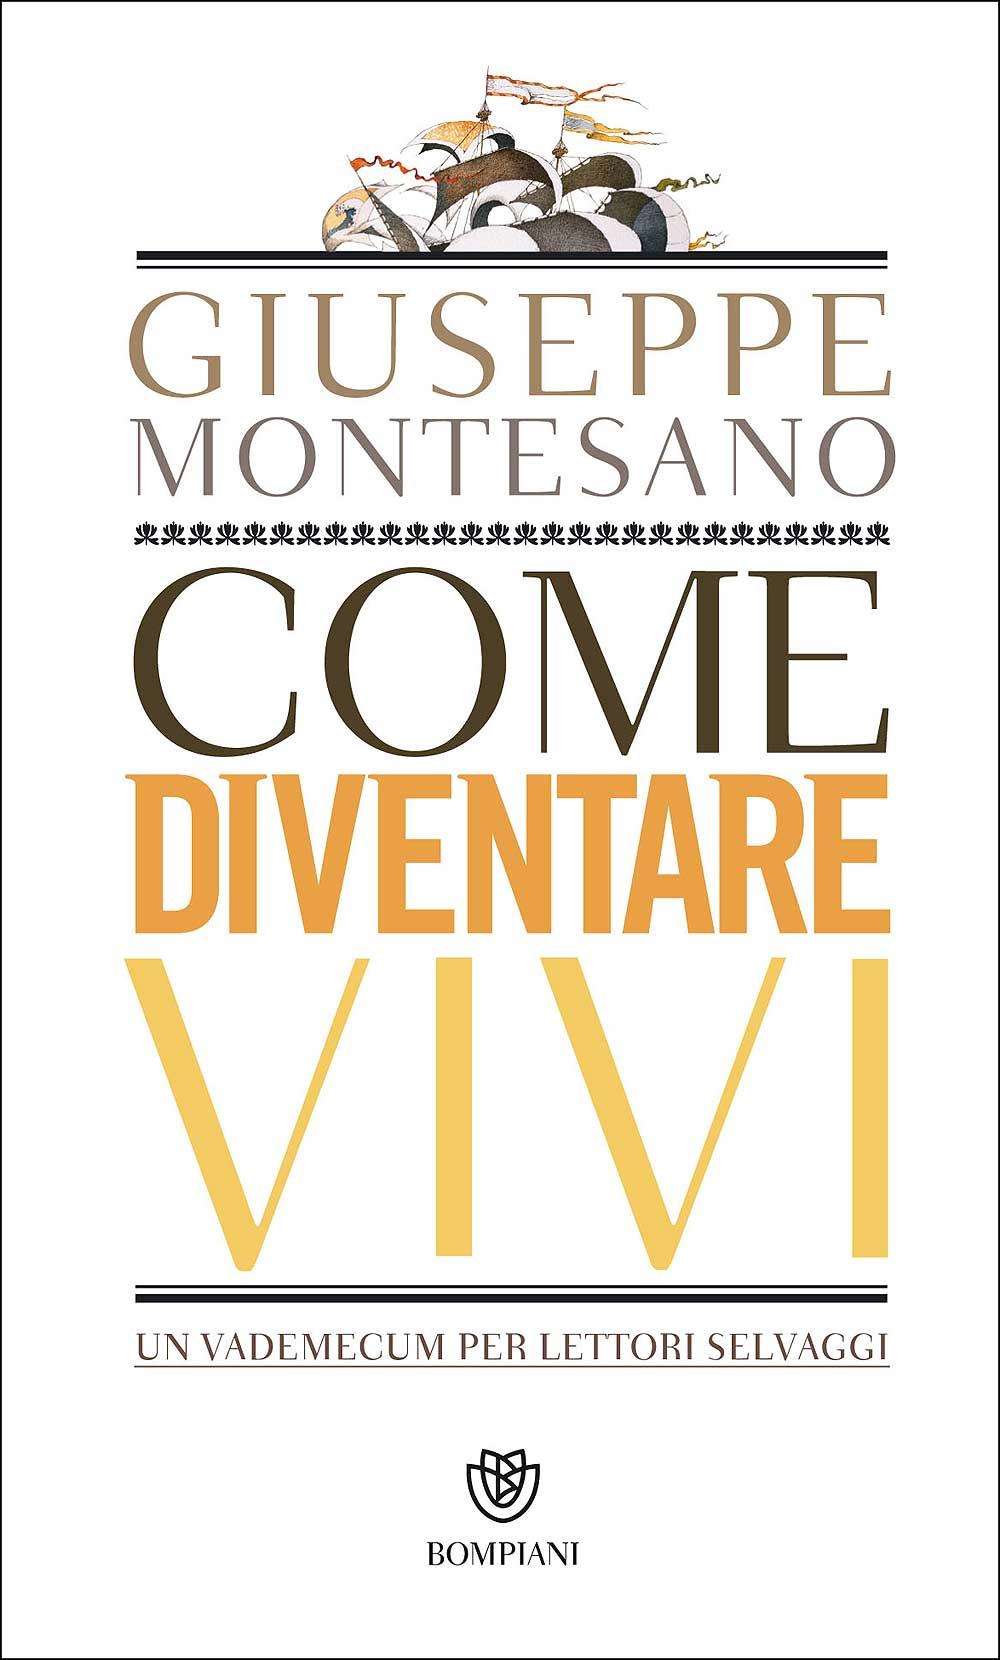 Giuseppe Montesano